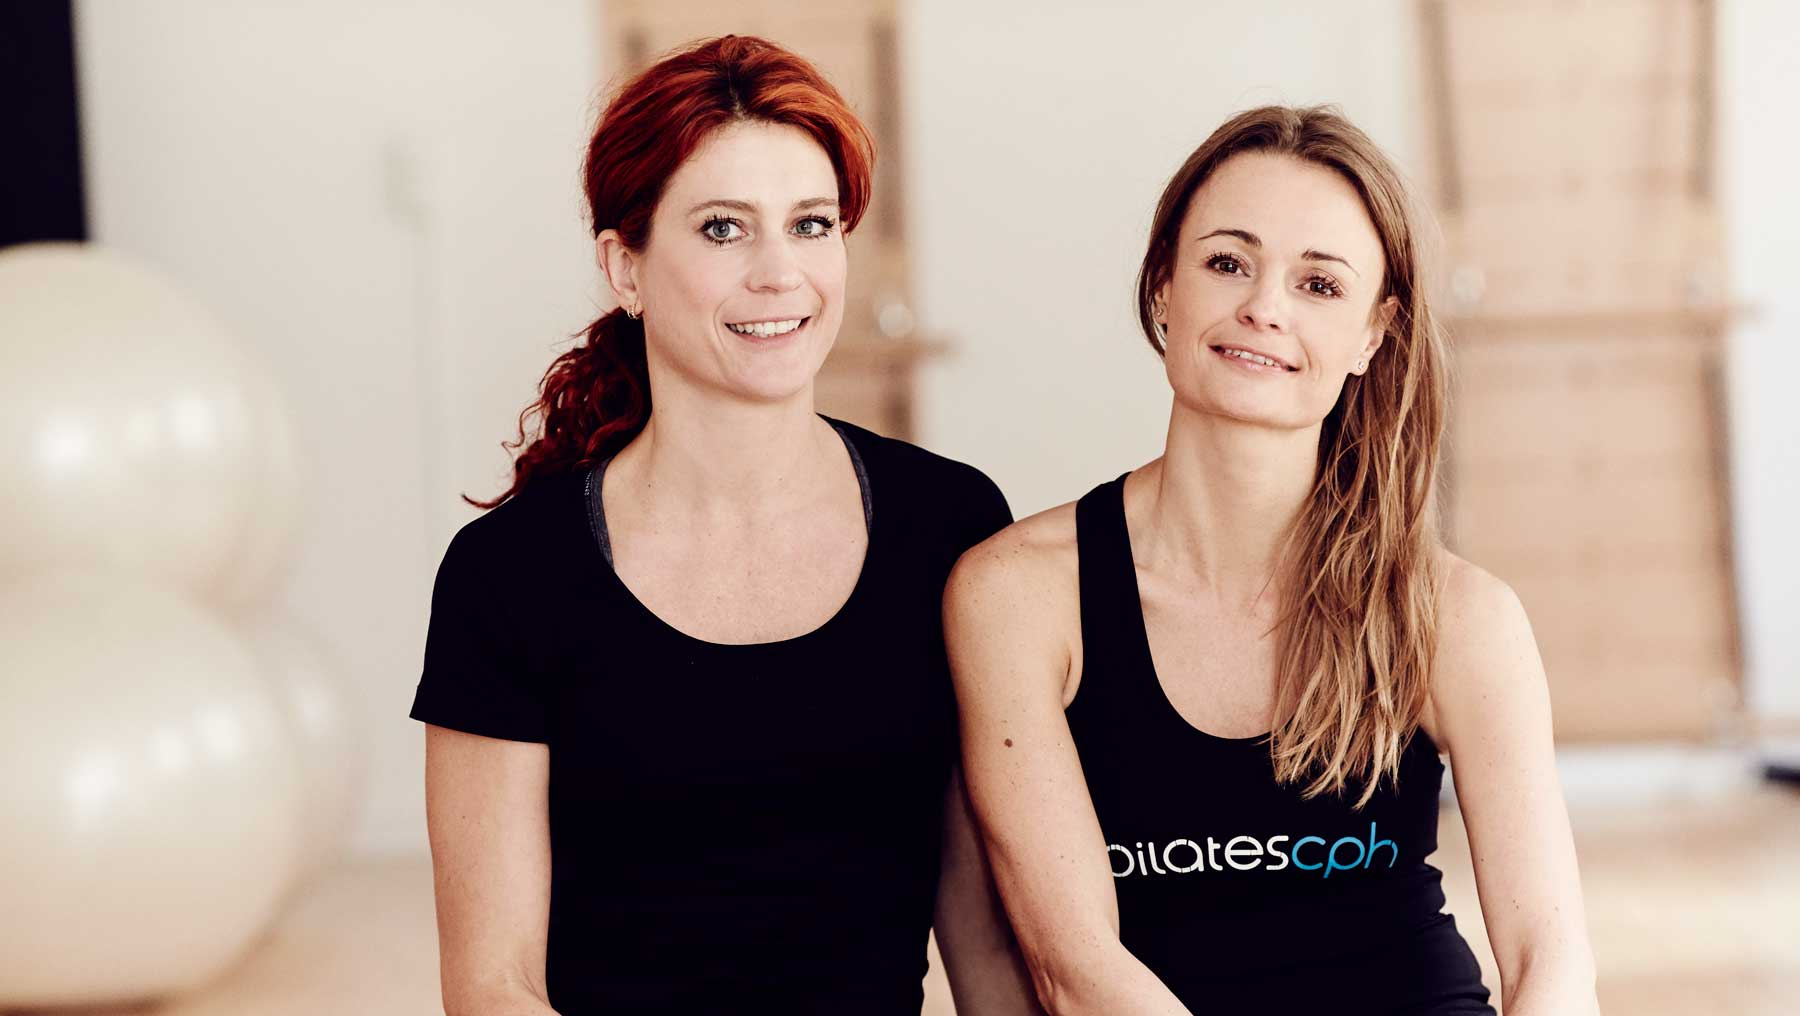 Gitte og Camilla - Pilates Cph Academy